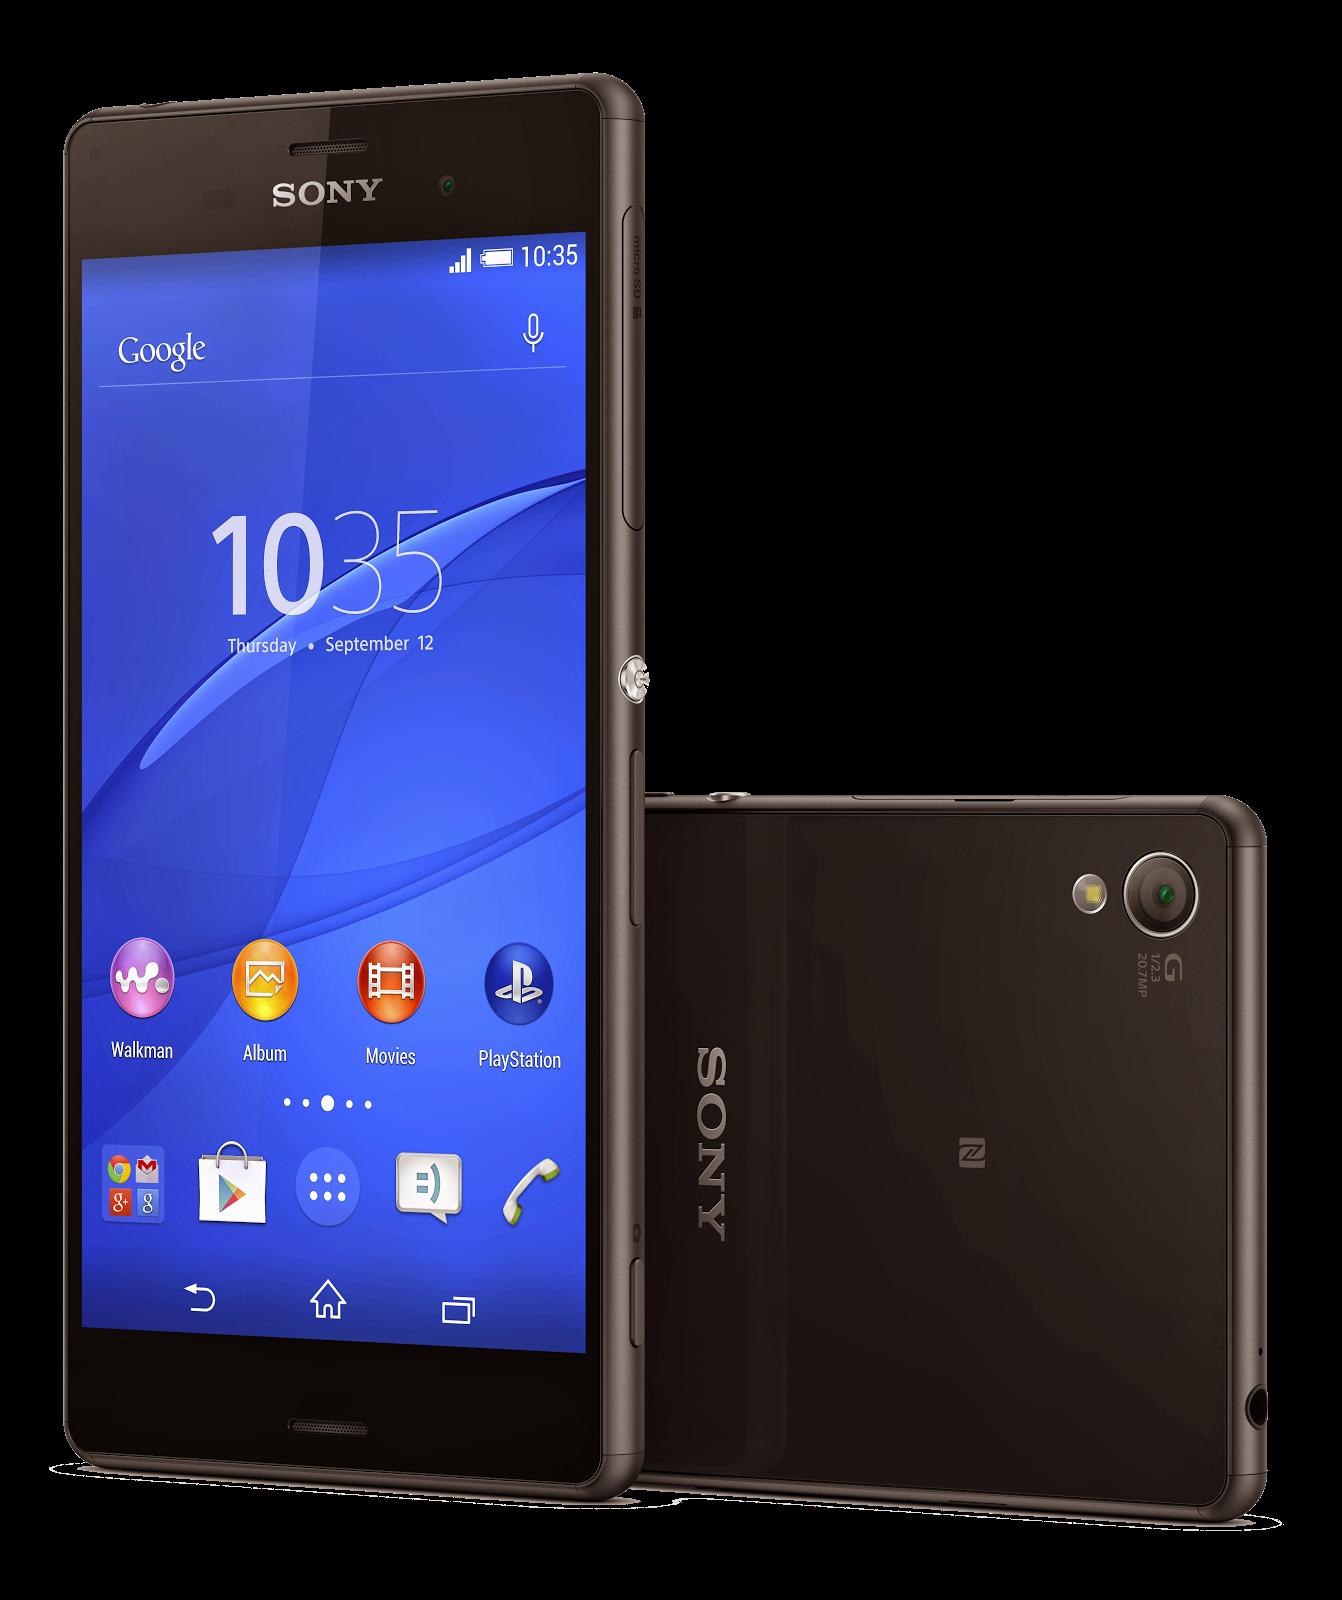 SONY Z3 china international [android phones]